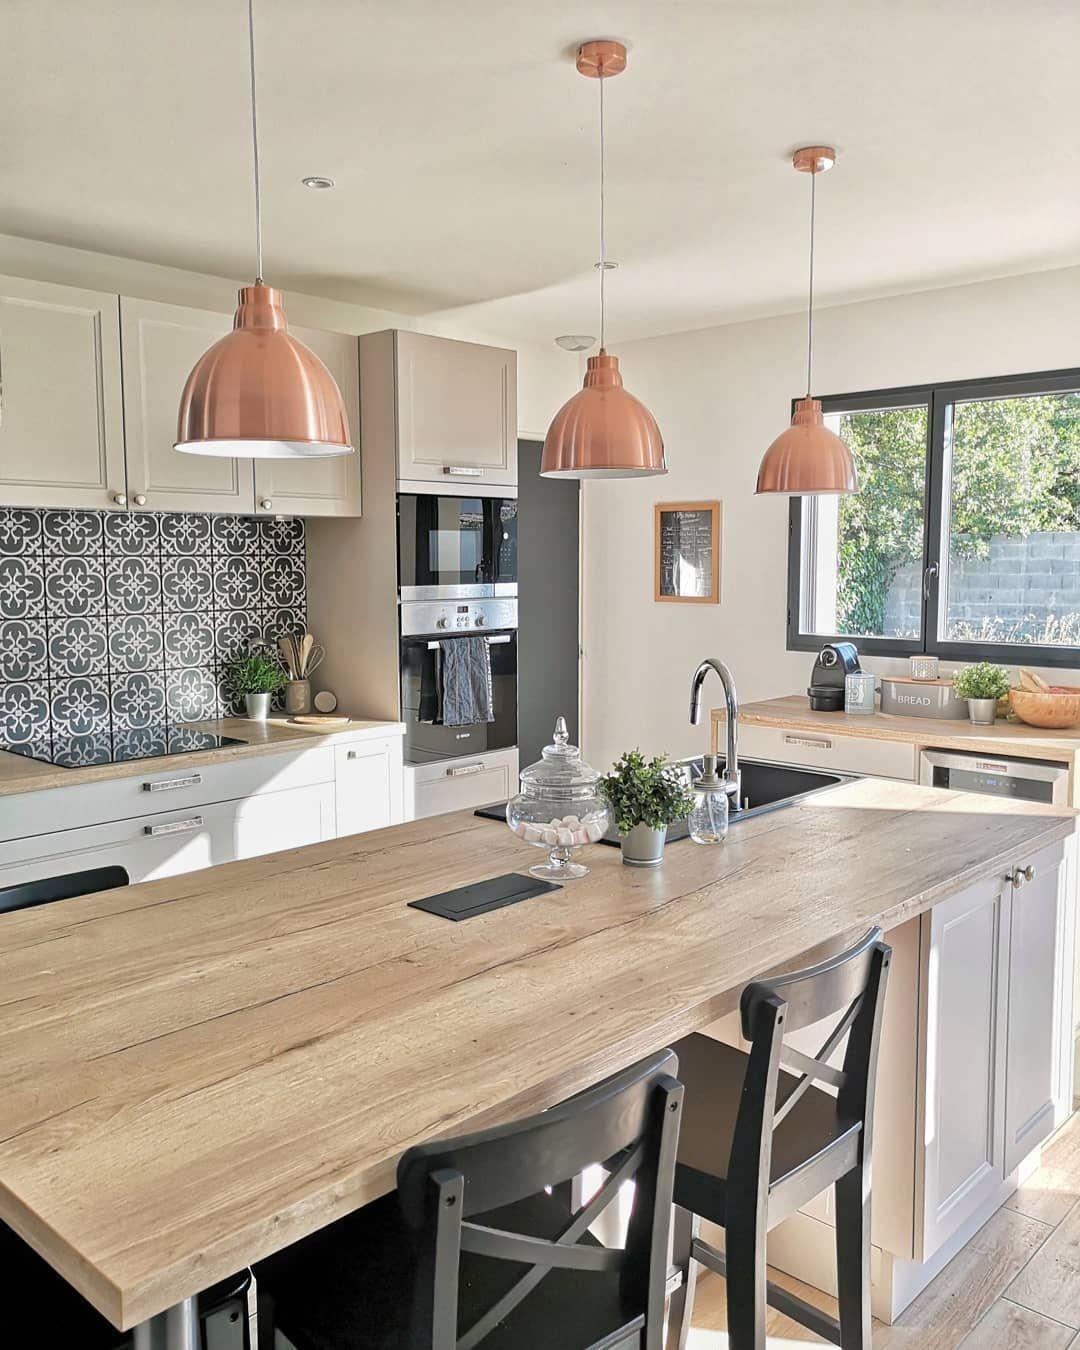 Ilot Central Kitchen Island Kitchen Remodel Small Modern Kitchen Island Kitchen Inspirations